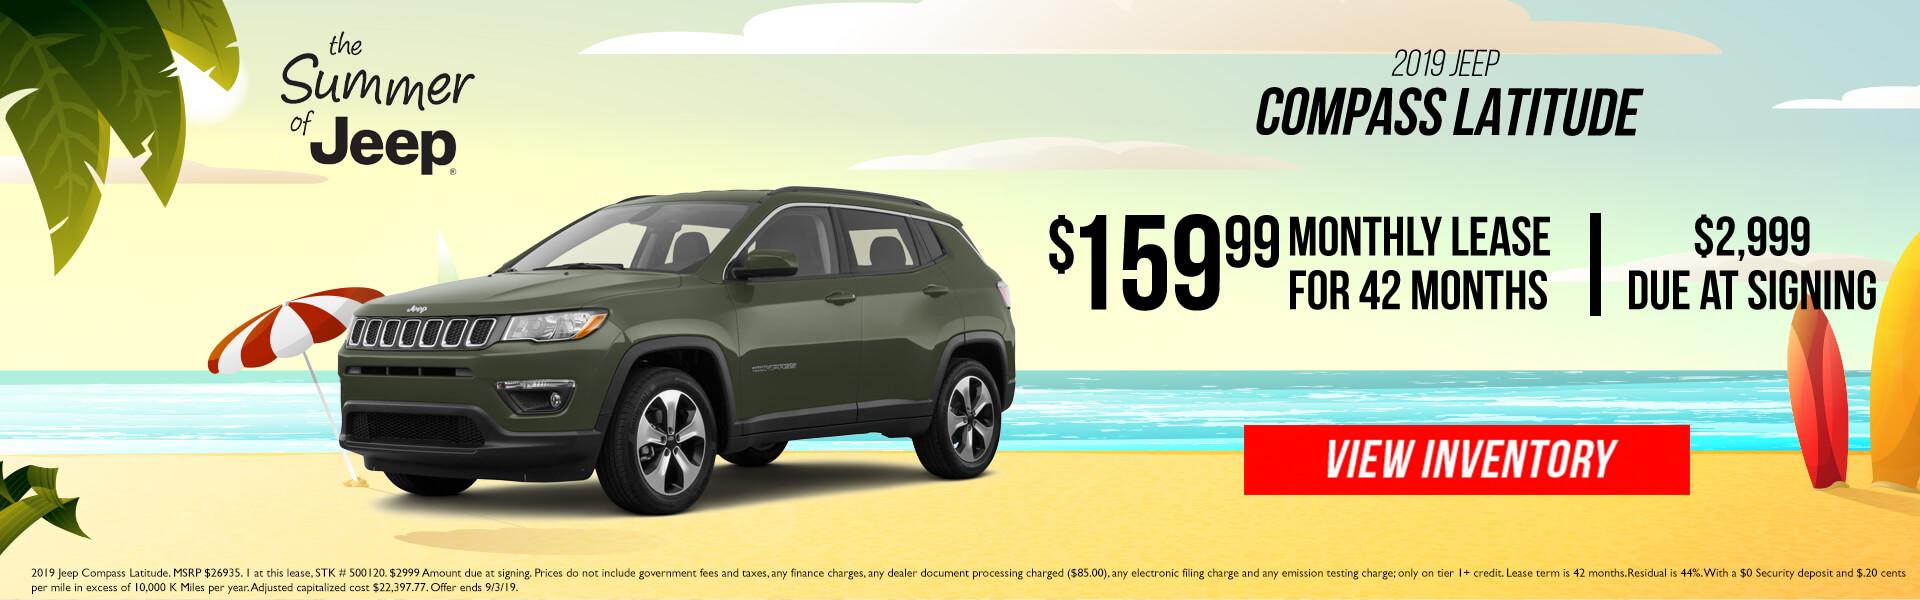 Jeep Compass 500012